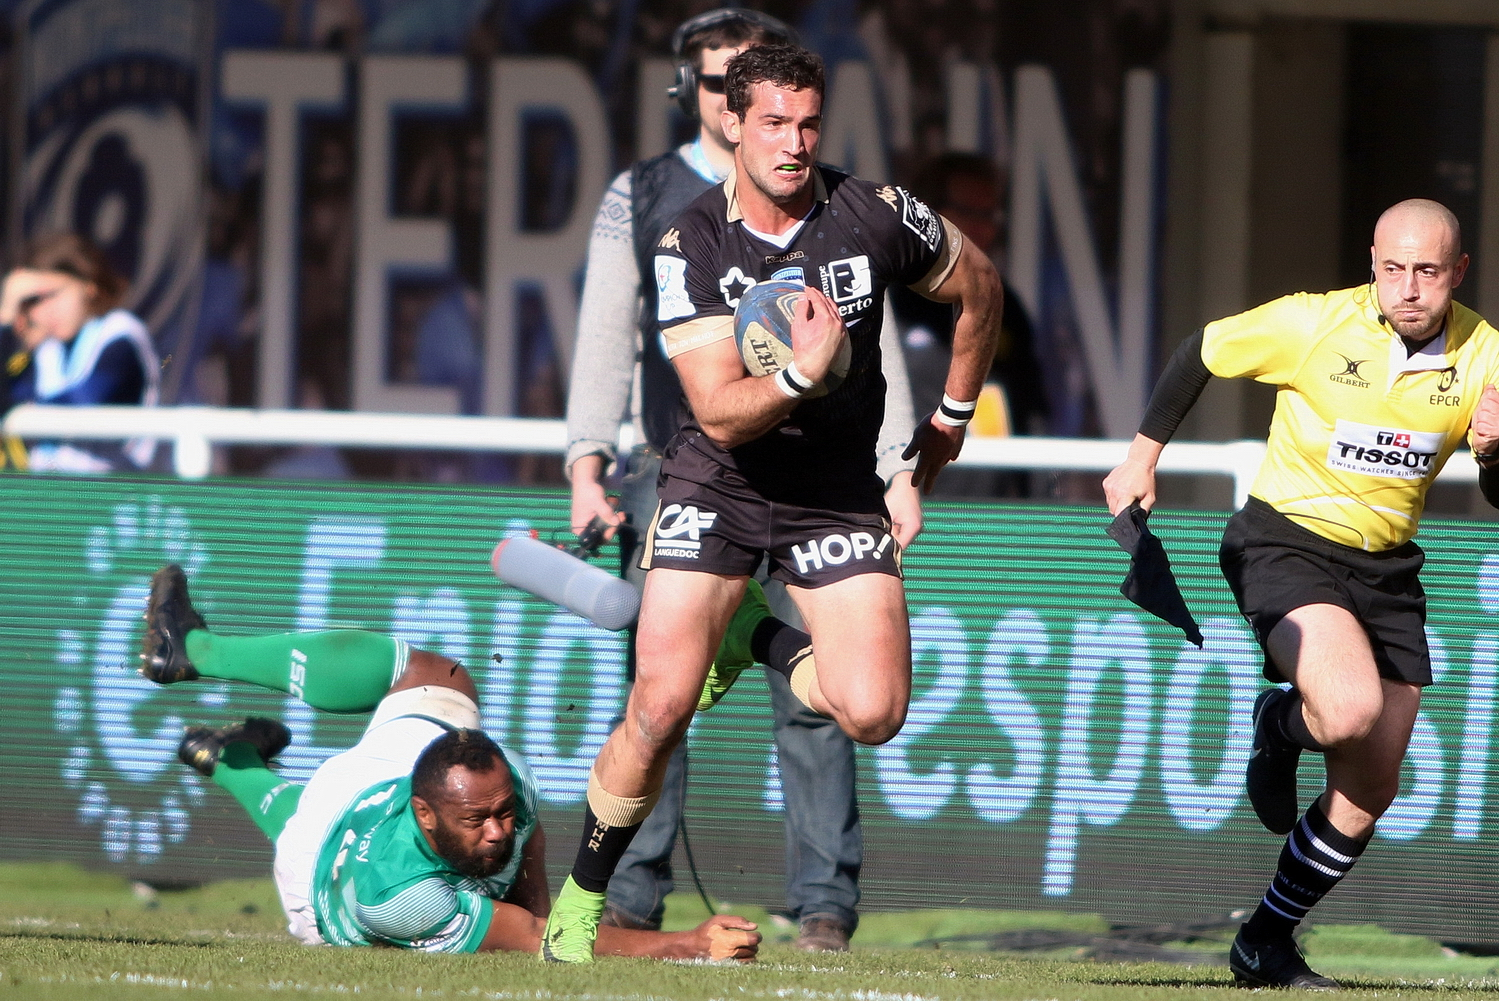 Rugby - Coupes d'Europe - Montpellier : enfin lancer sa saison à Edimbourg